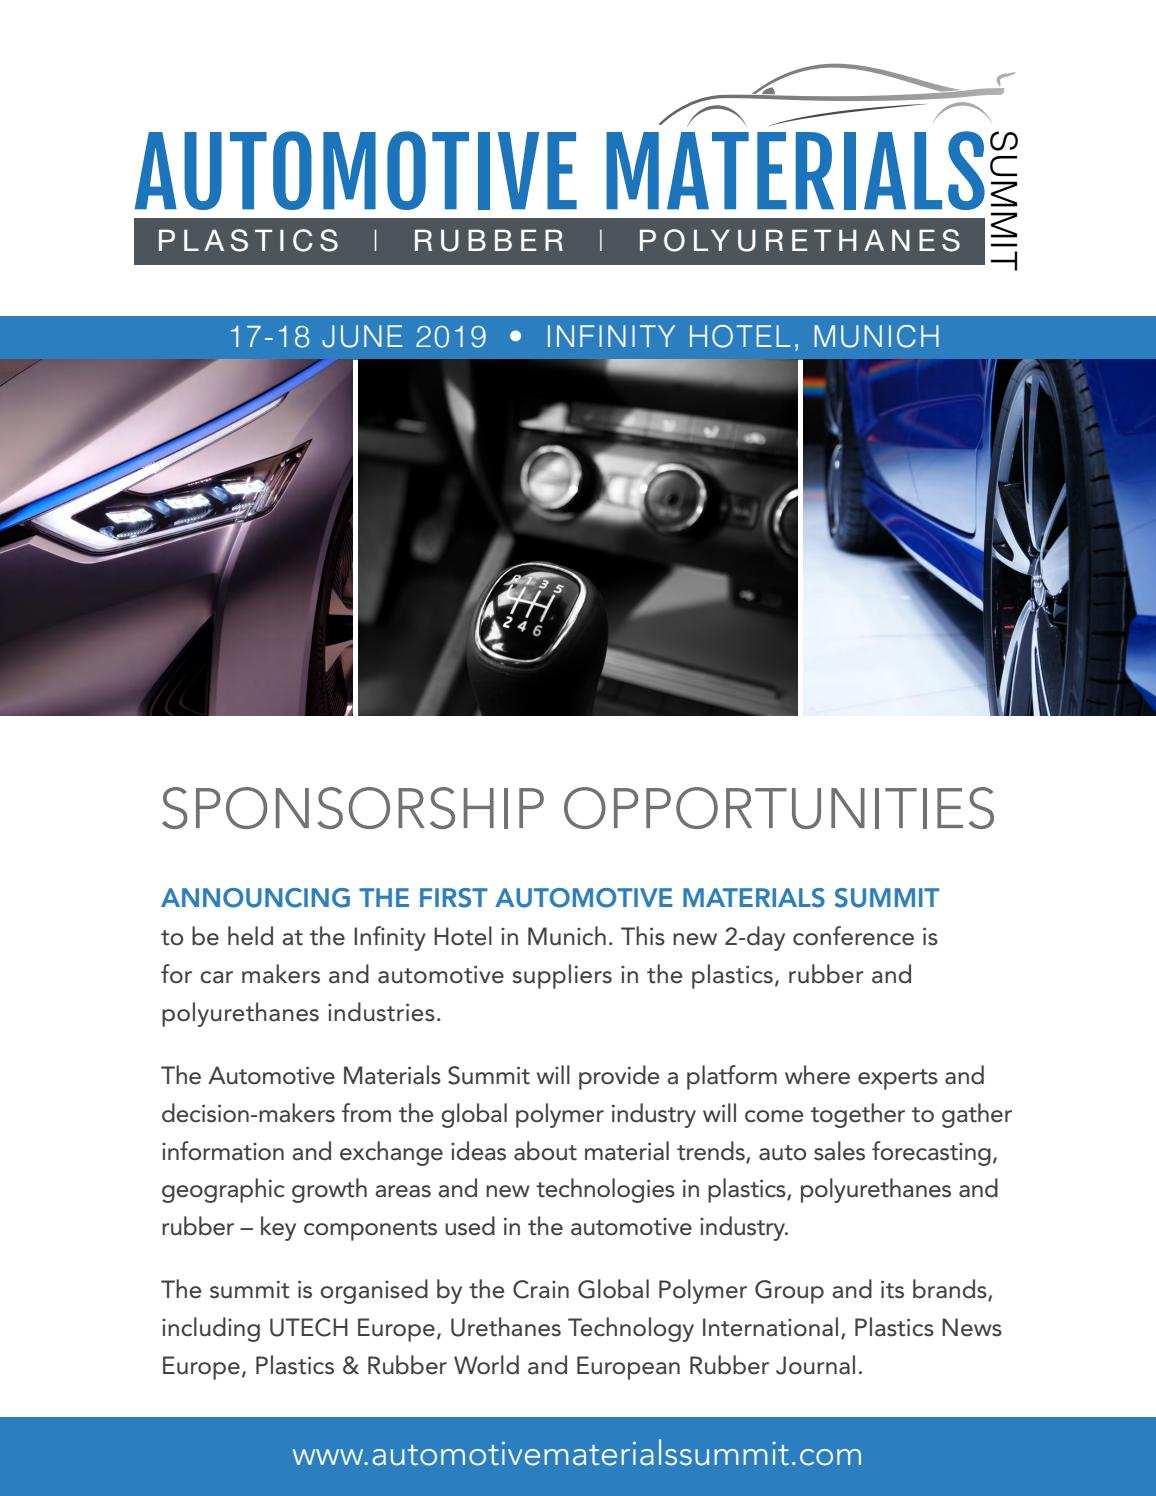 Automotive Materials Summit 2019 Sponsorship Brochure by crain3 - issuu